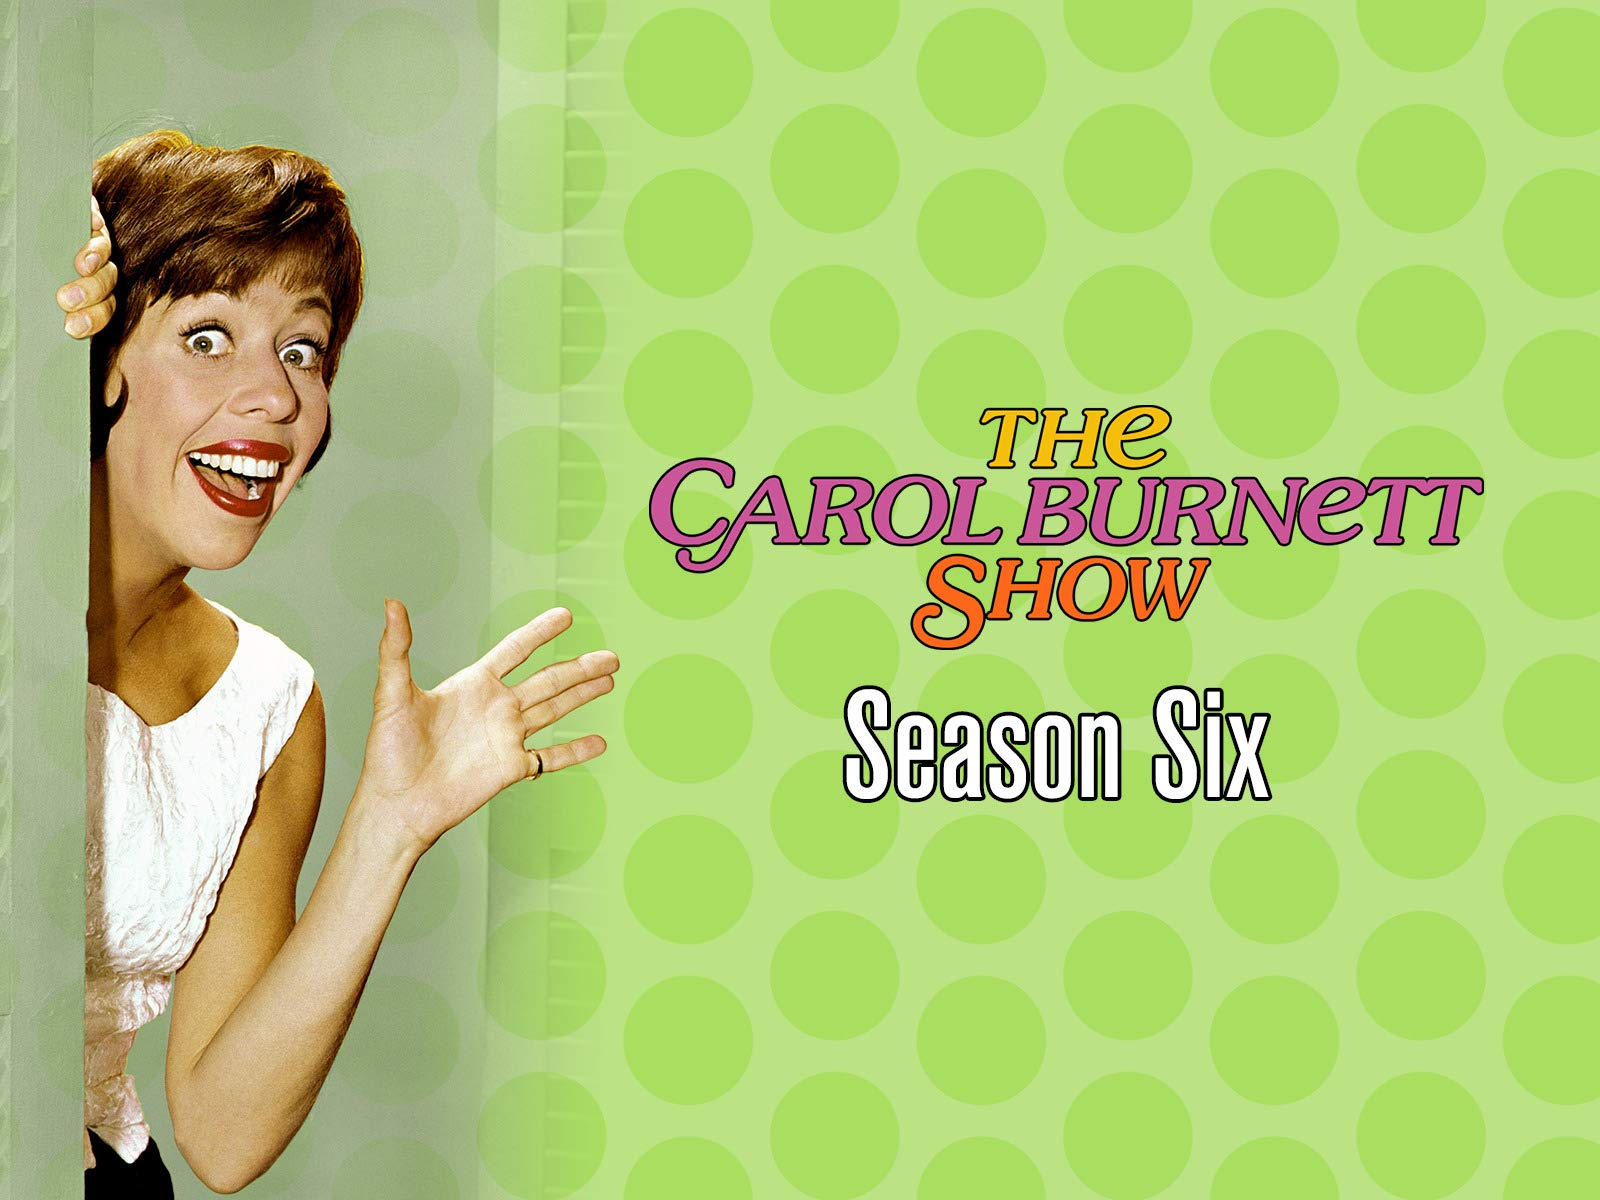 The Carol Burnett Show - Season 6